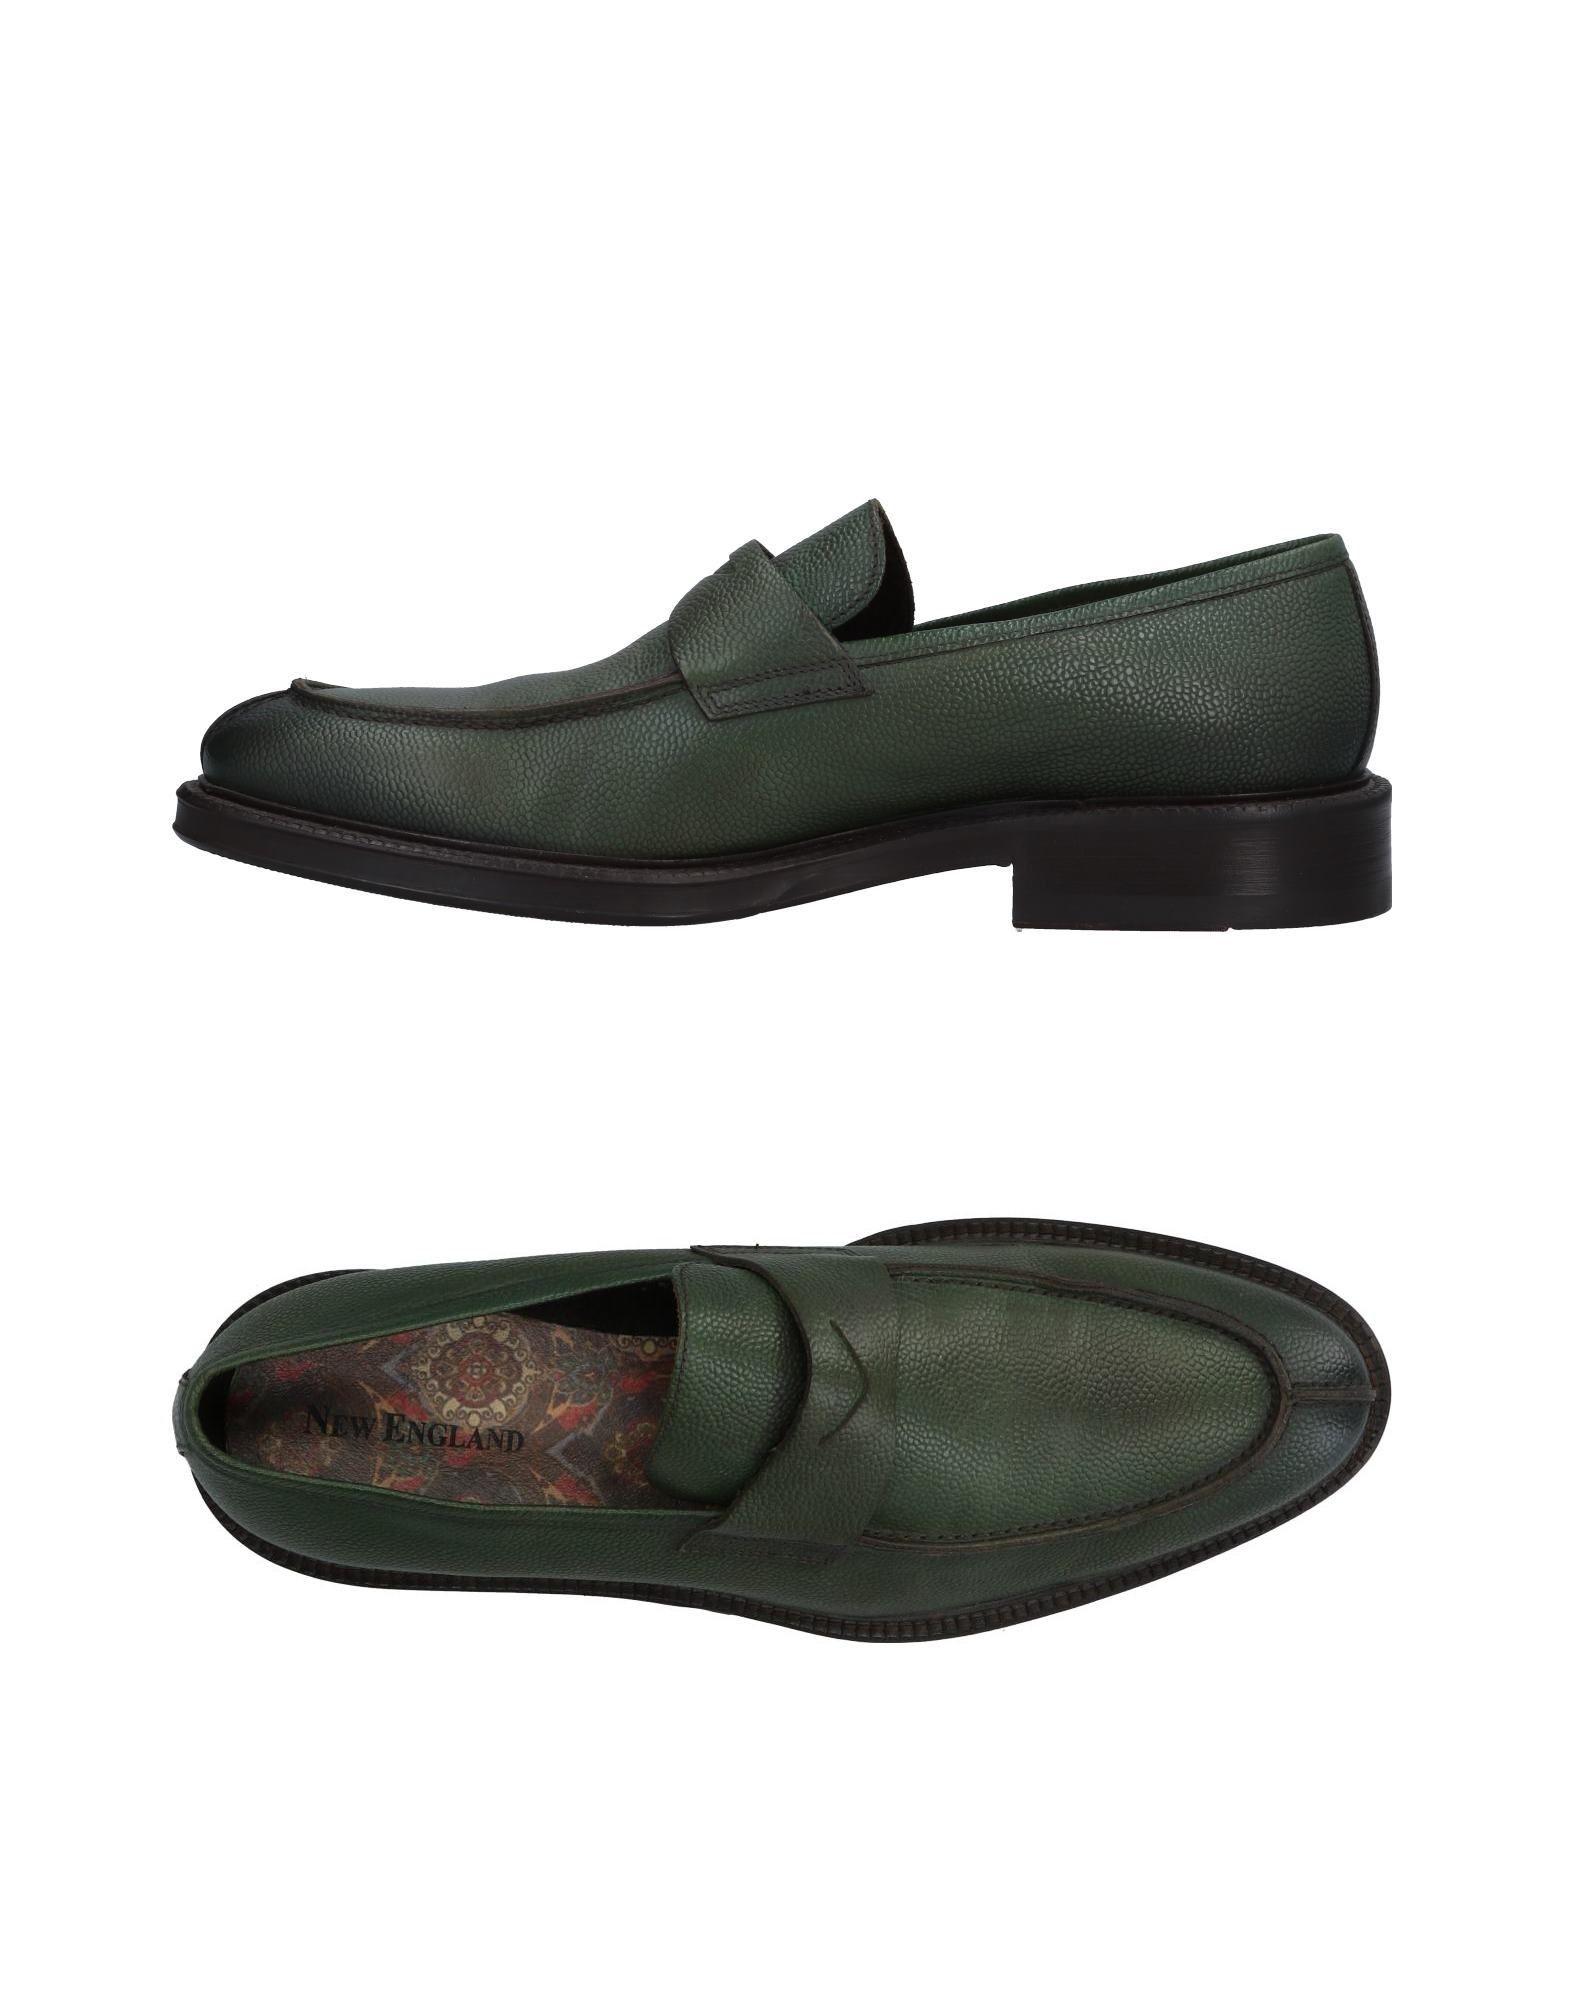 Rabatt echte Schuhe New England Mokassins Herren  11497008WB